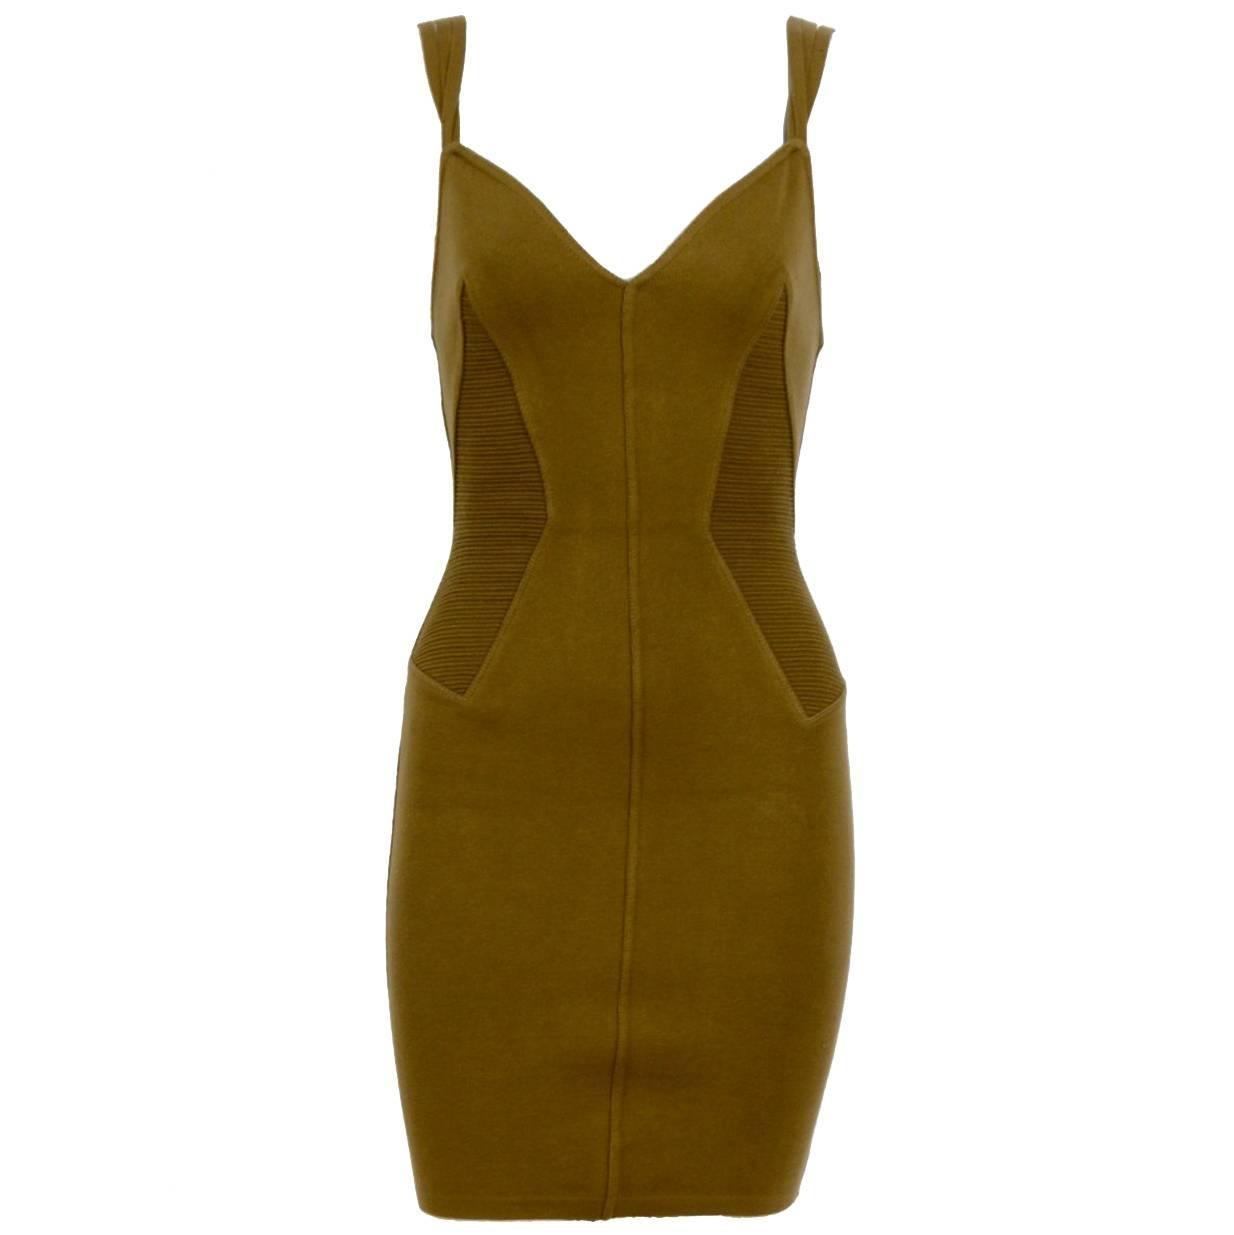 Alaia spring summer collection dress,  1990